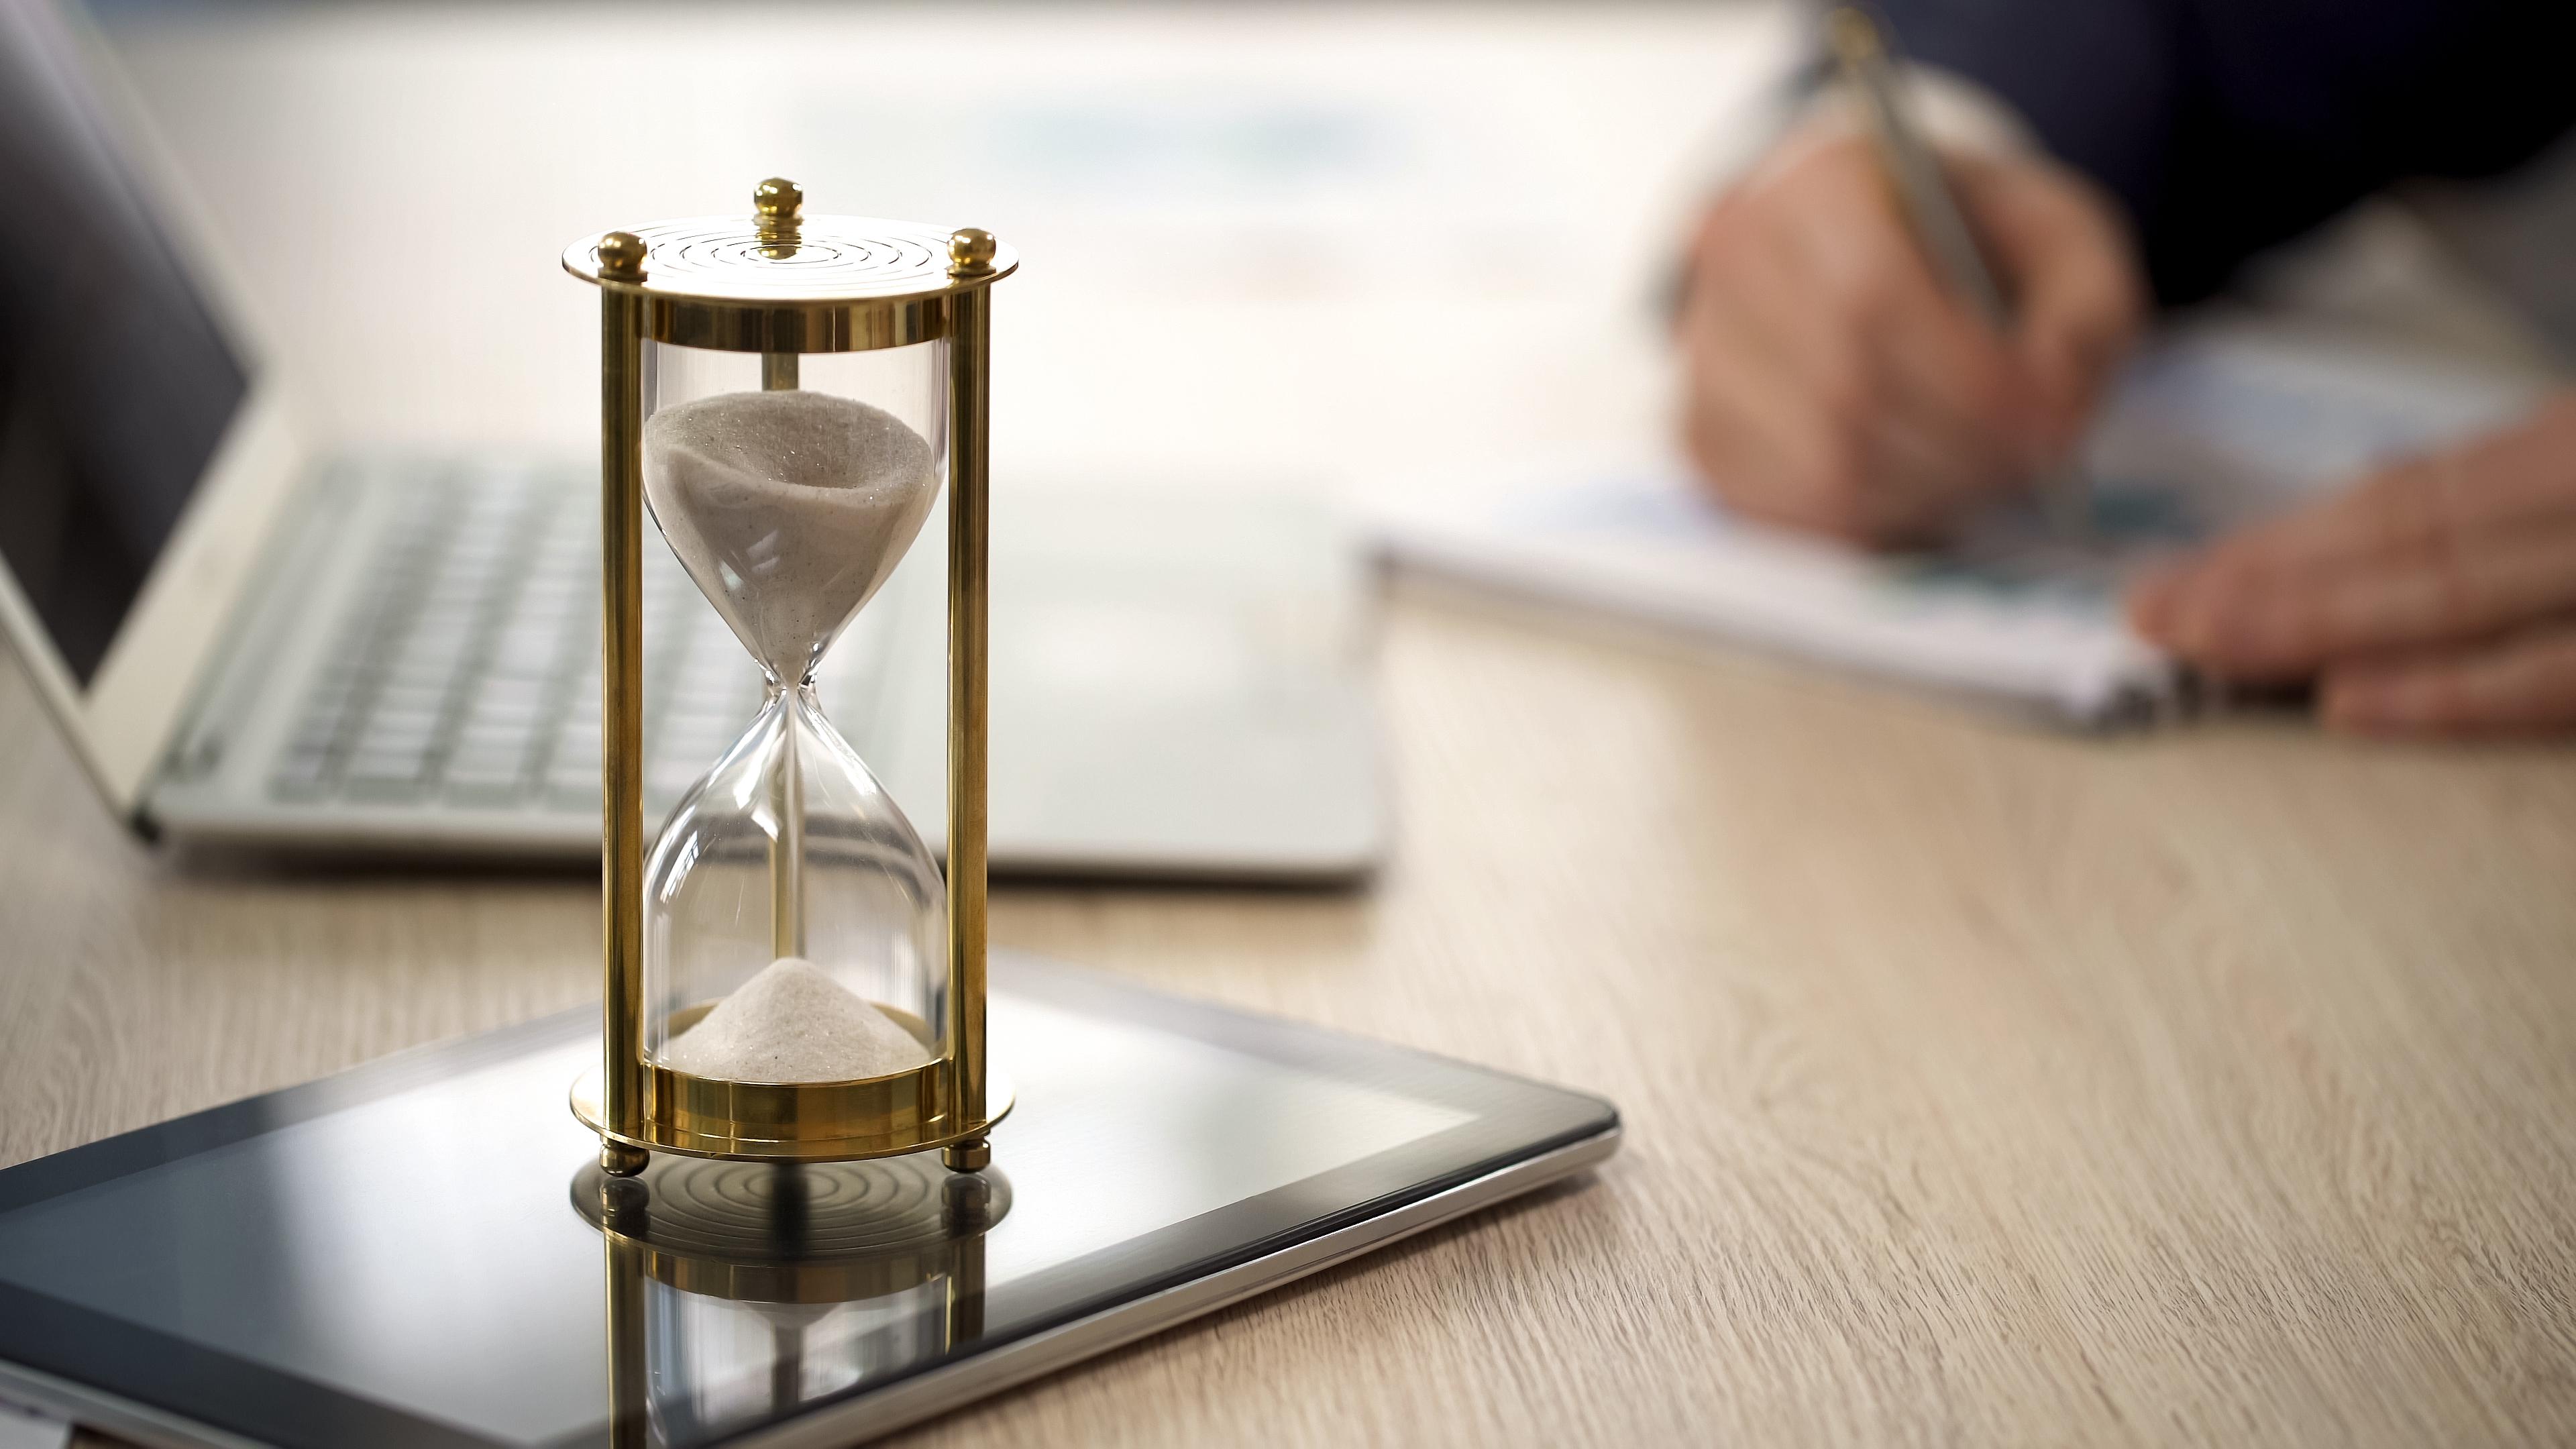 An hourglass on a desk